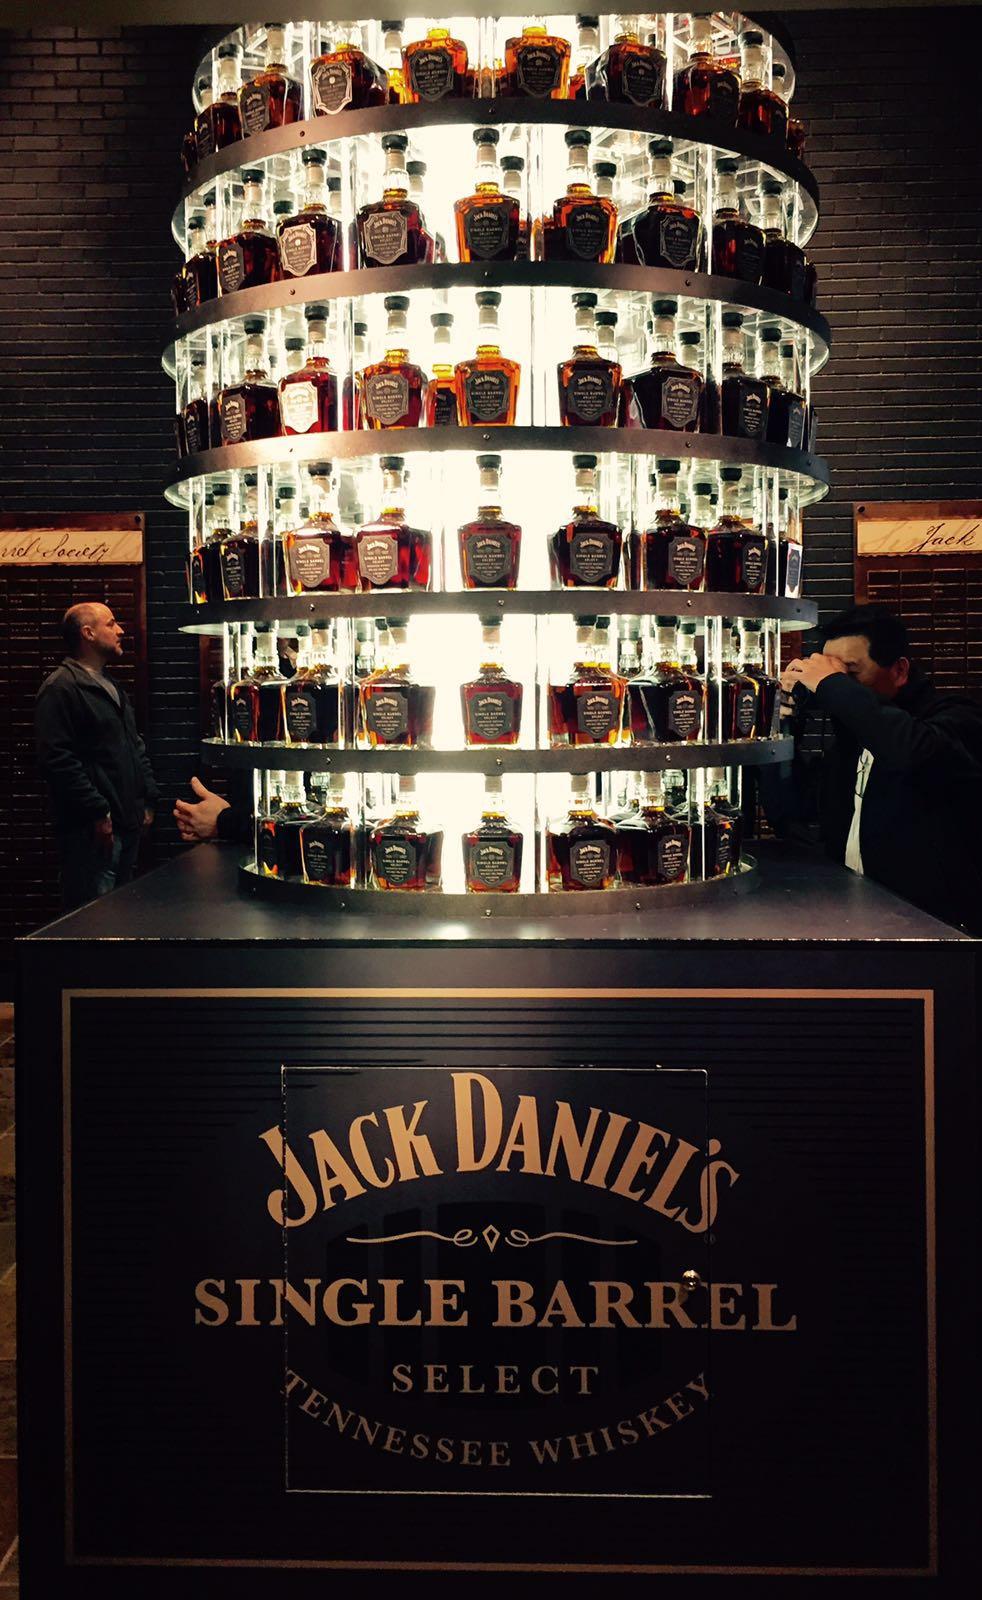 Jack Daniels Nashlorette